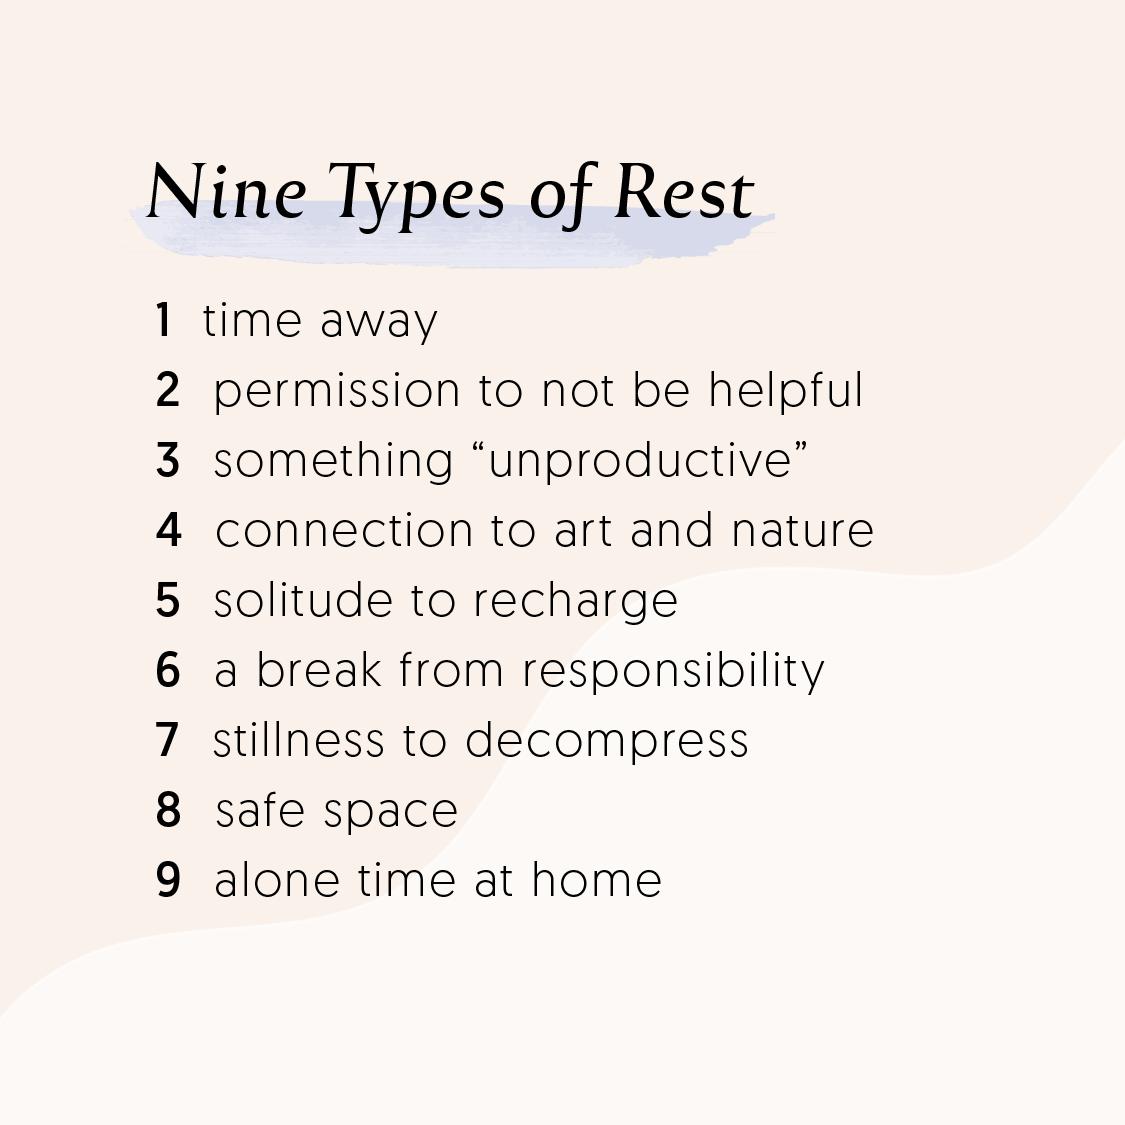 Nine Types of Rest Original Post by Steph Barron Hall — Nine Types Co.